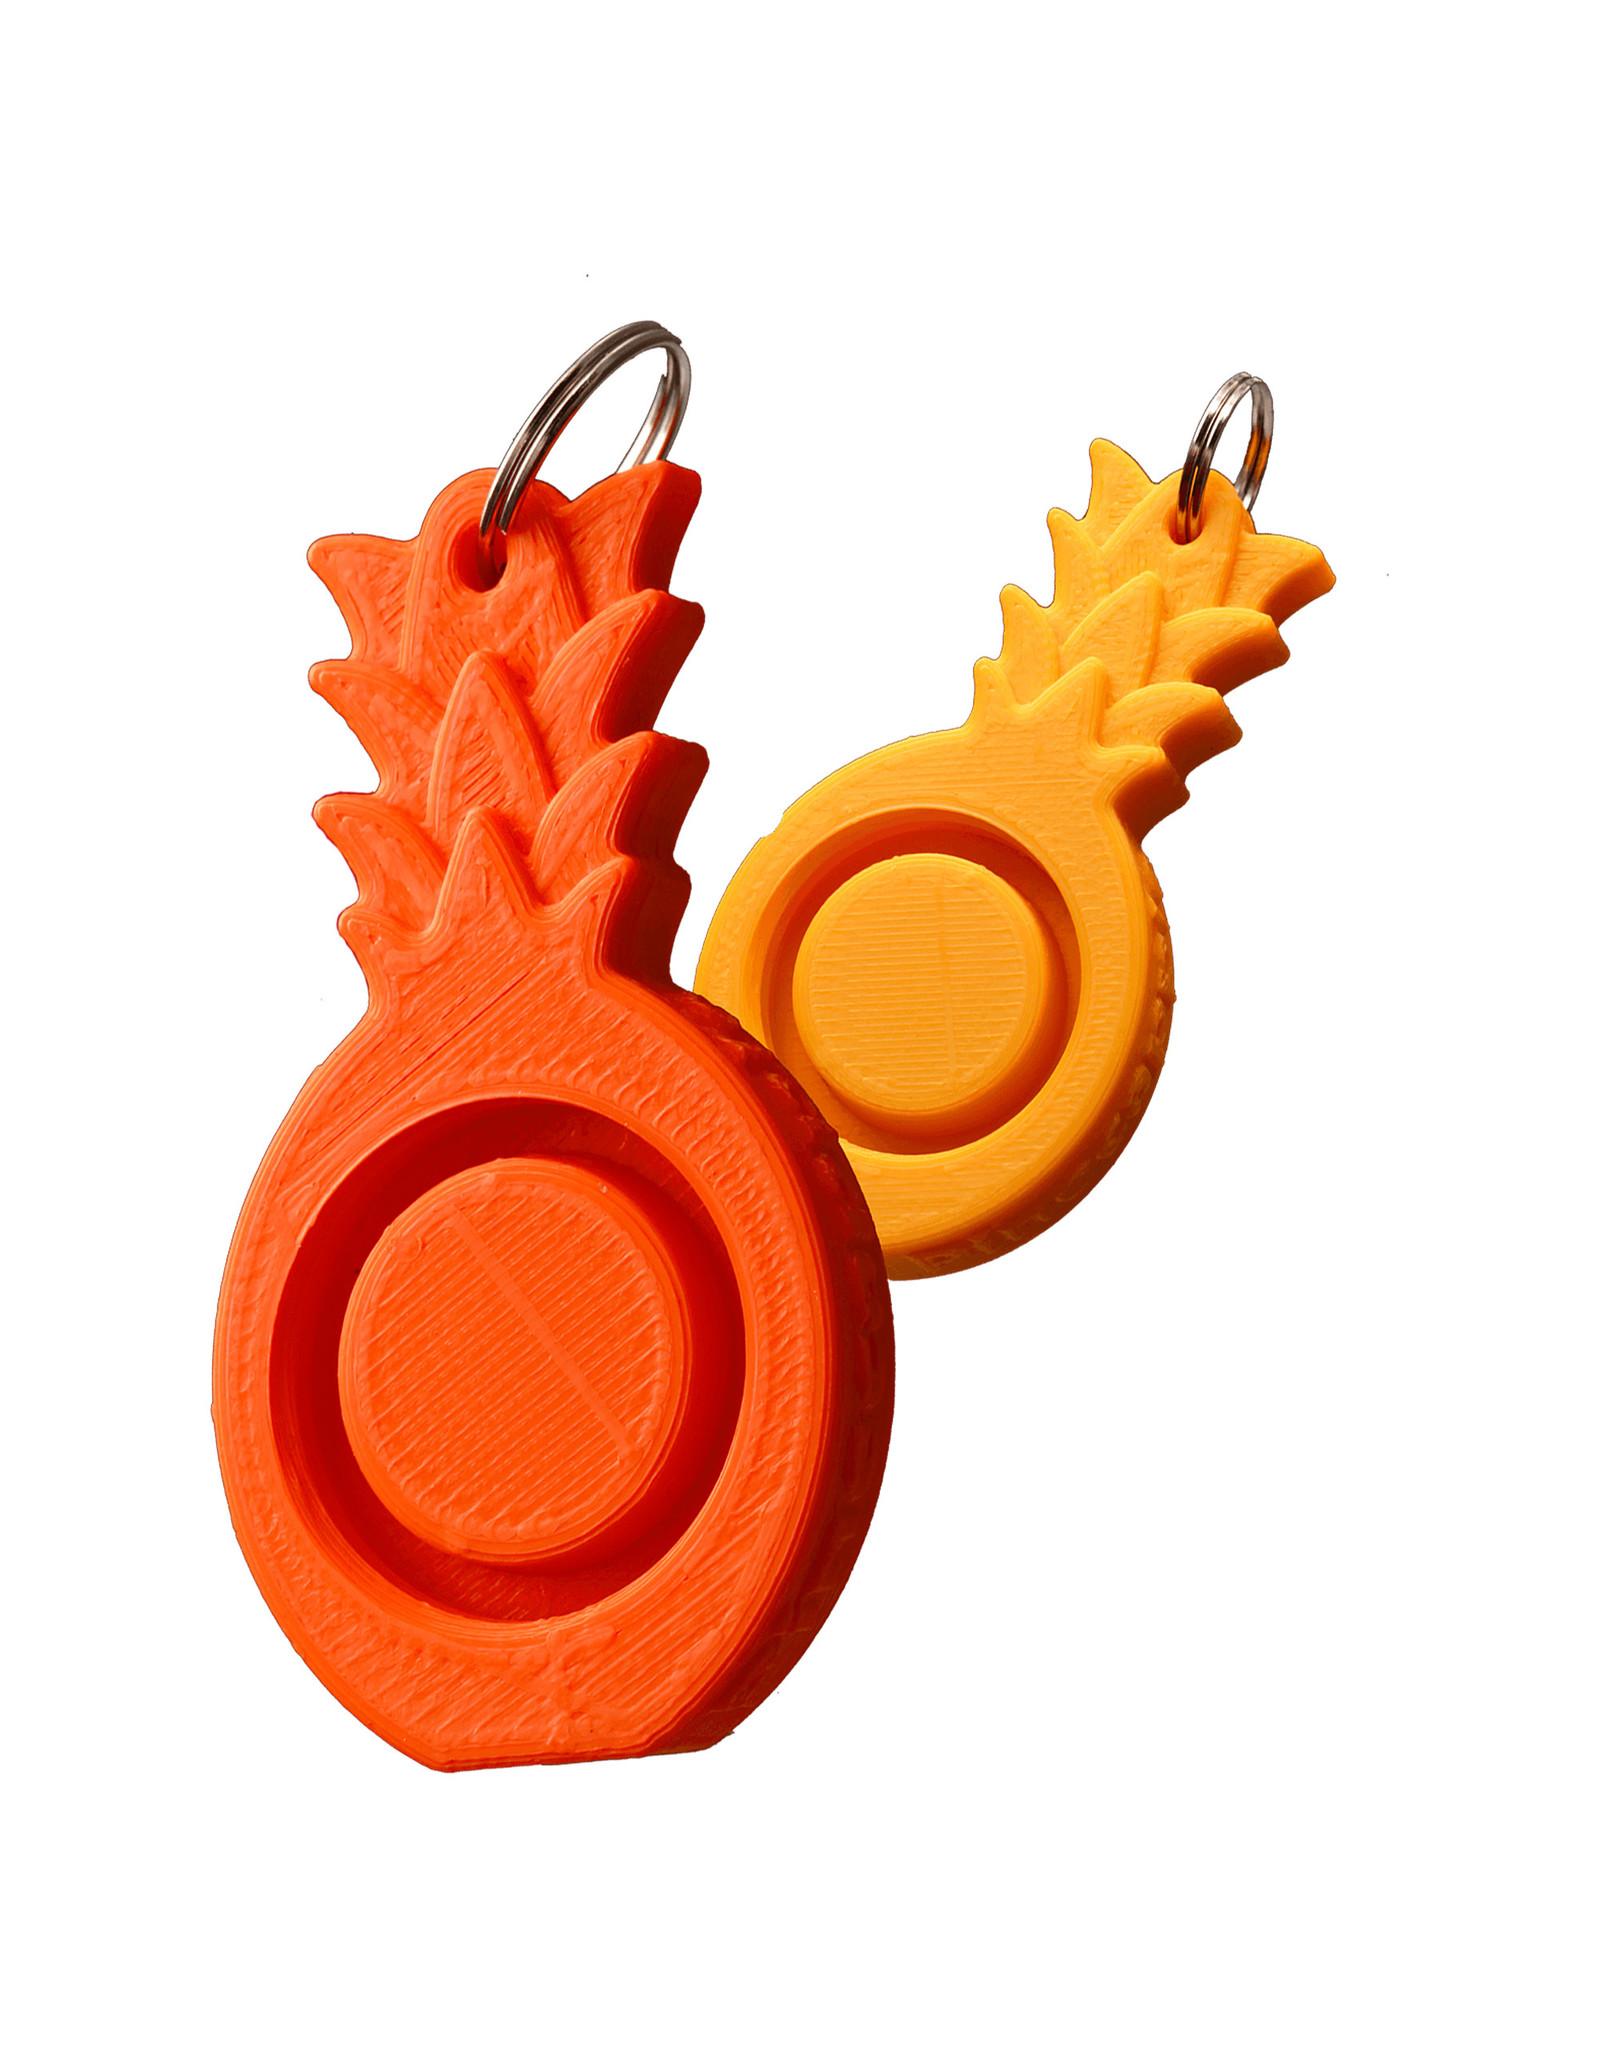 Festicap Pinecapple | A fresh and juicy Festicap, go get that tropical feeling!